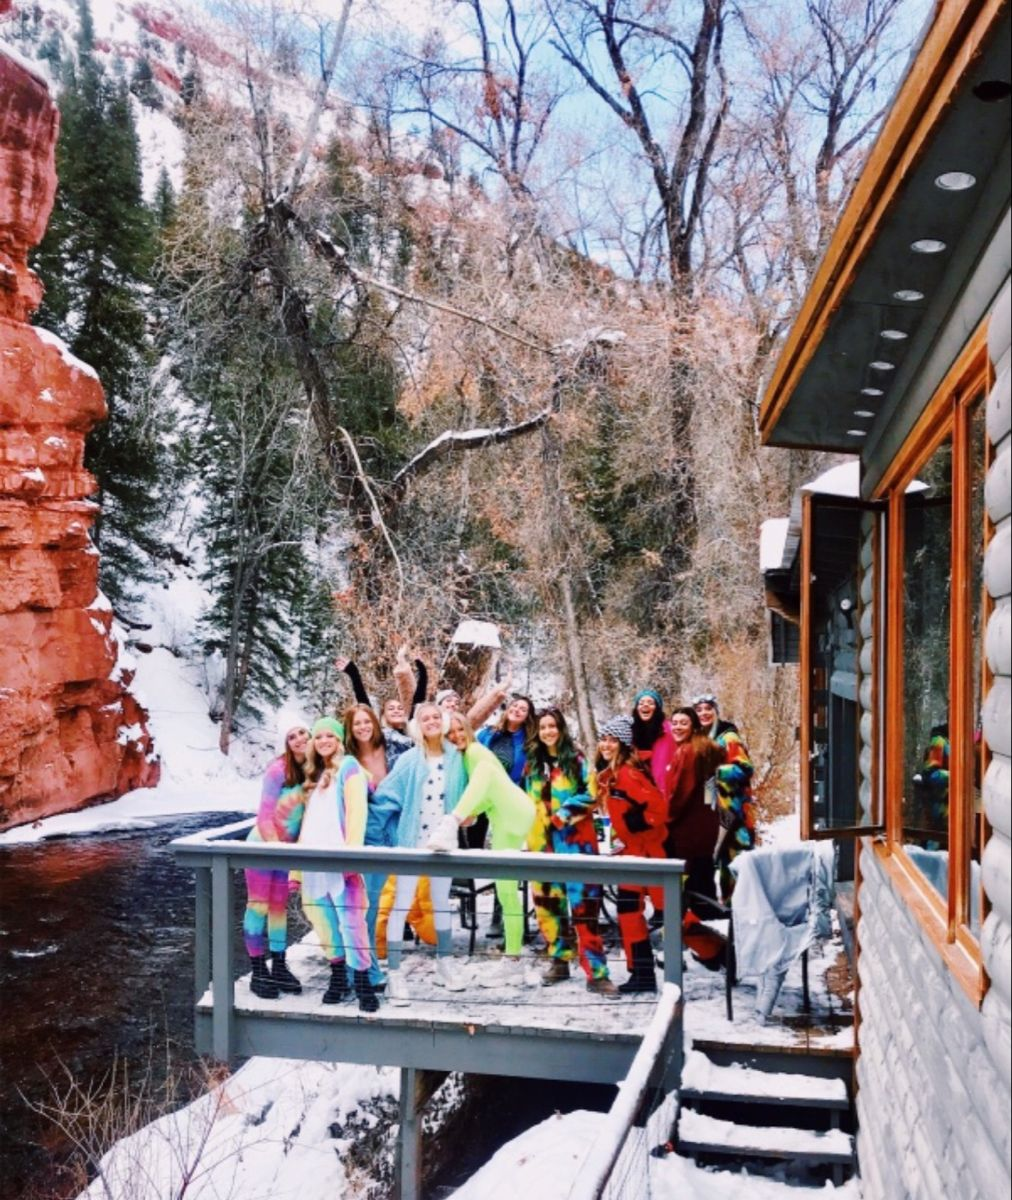 Pinterest Zoewro In 2020 Cabin Trip Ski Trip Adventure Outfit Hiking